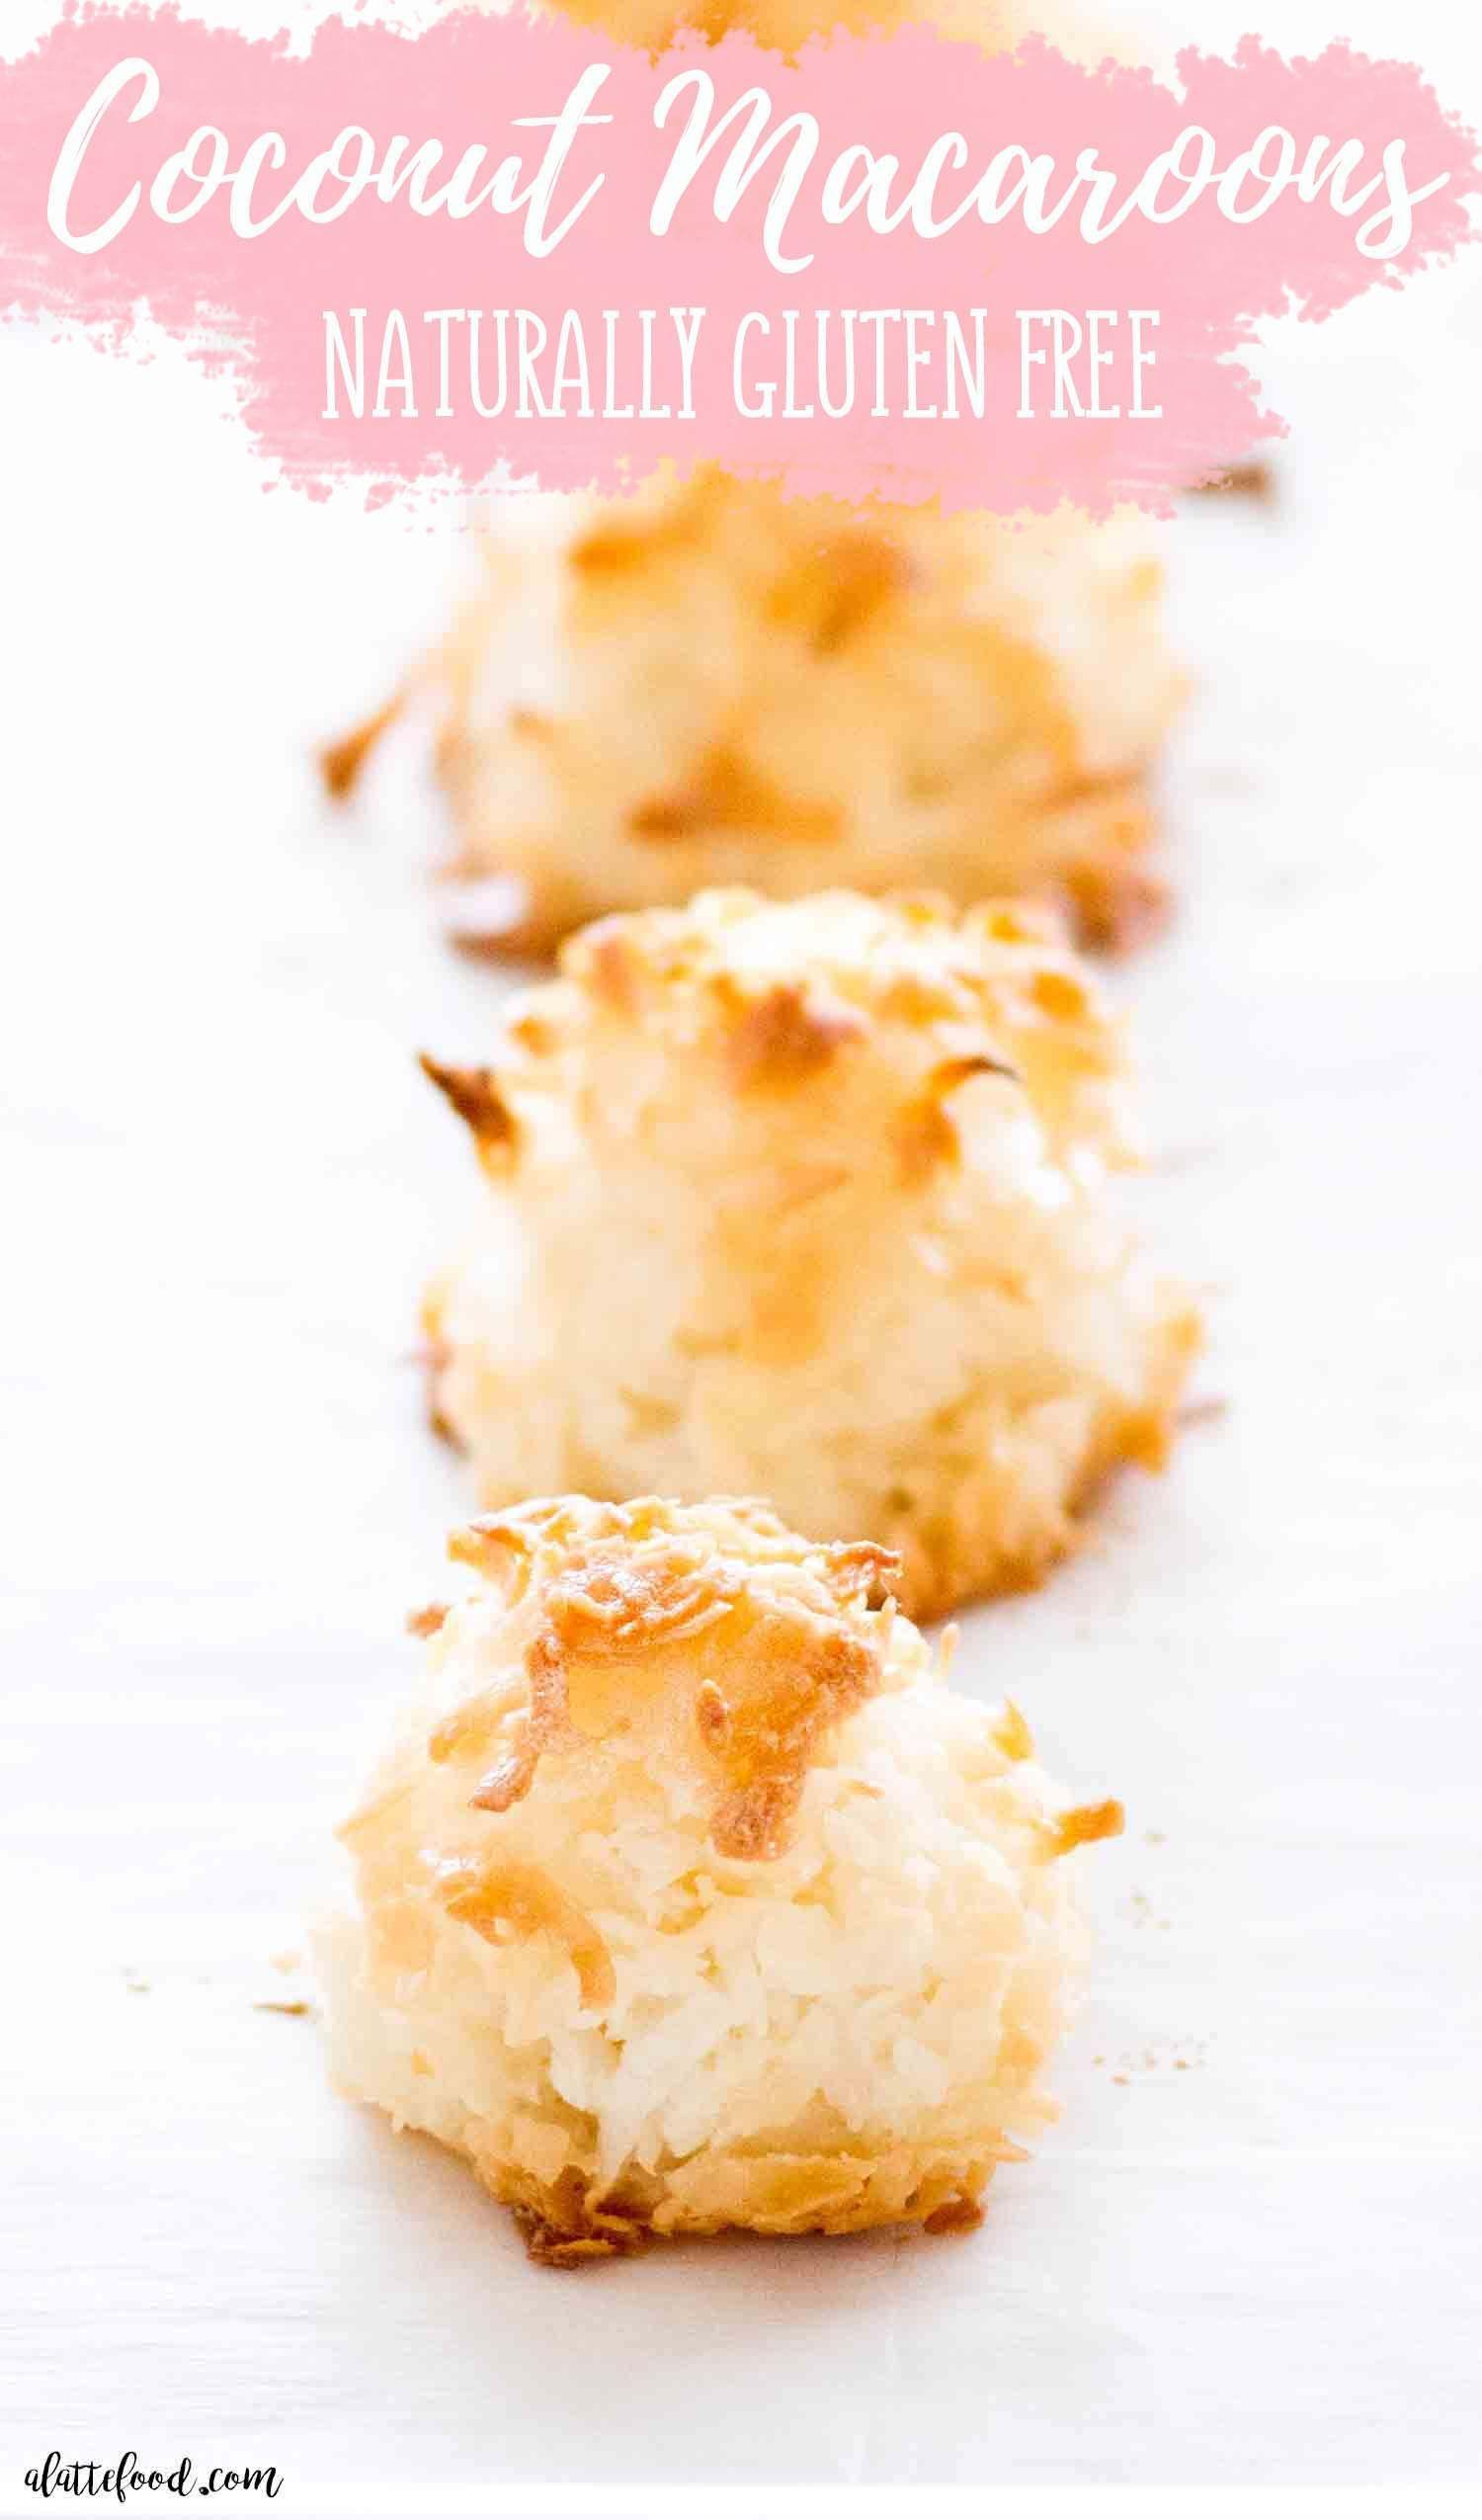 Easy Coconut Macaroons In 2020 Coconut Macaroons Easy Coconut Macaroons Easy Baking Recipes